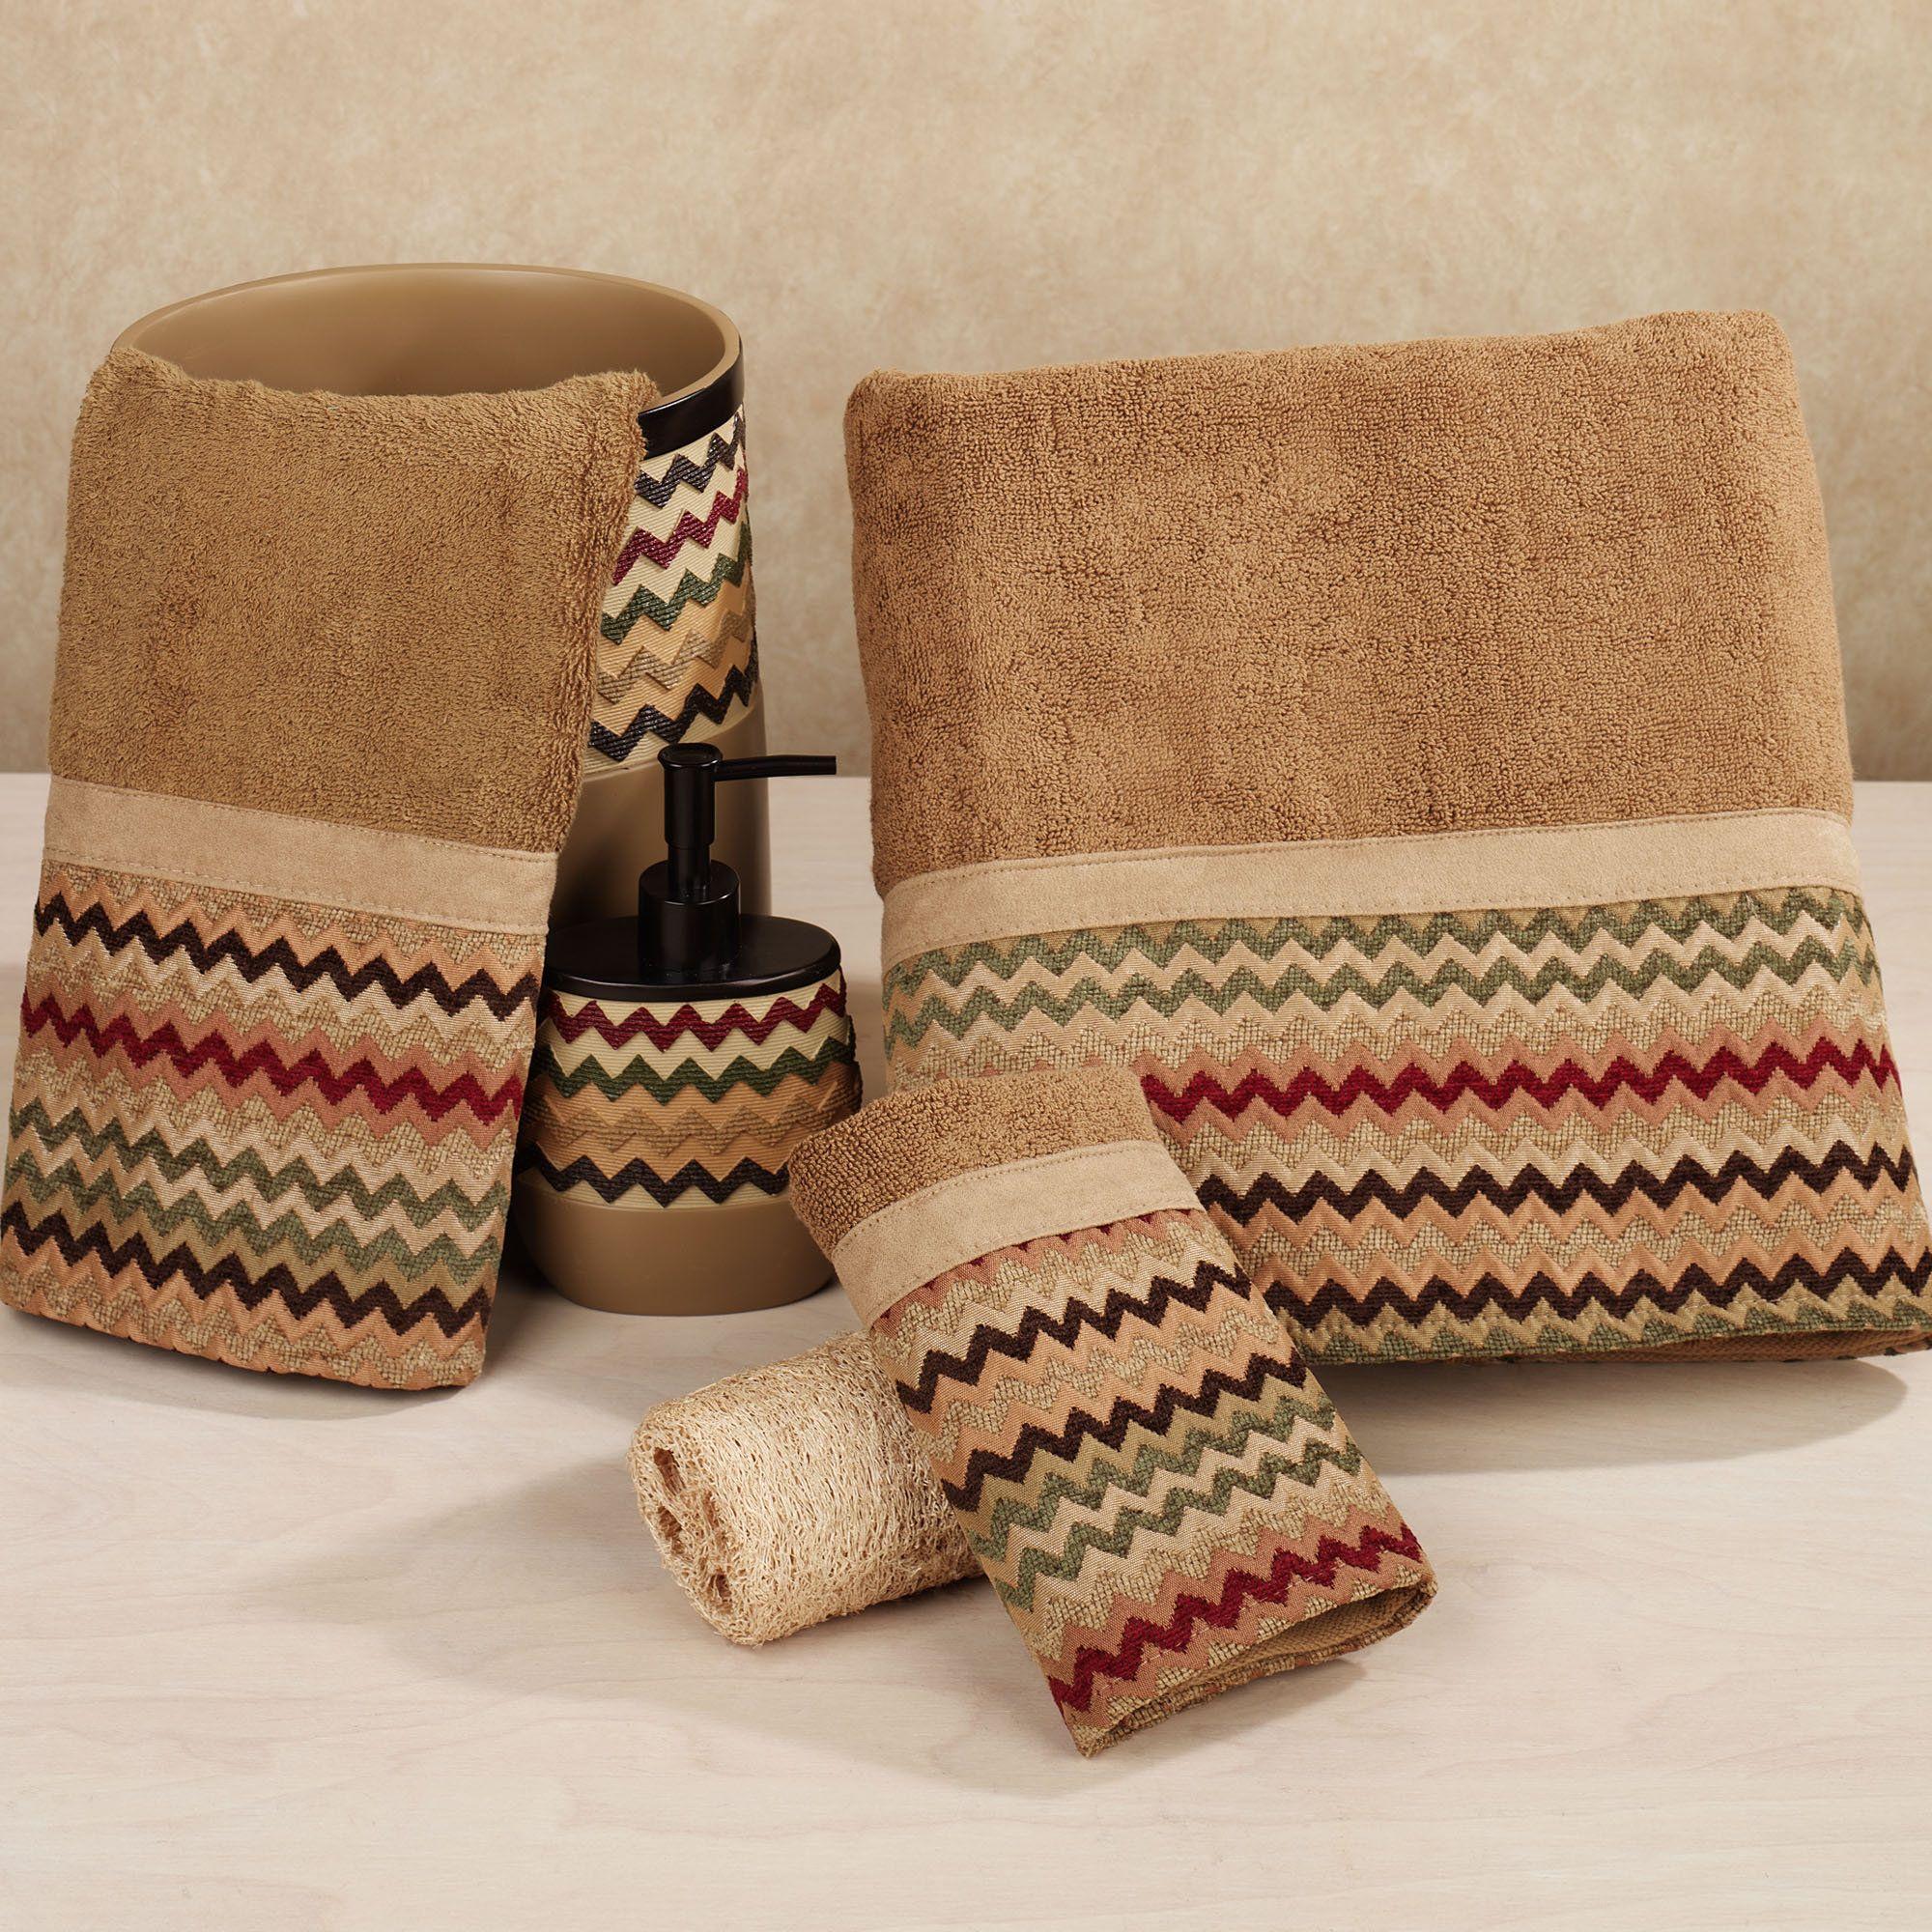 Southwest Kitchen Towel Designs Home Waves Towel Set Tan Brown